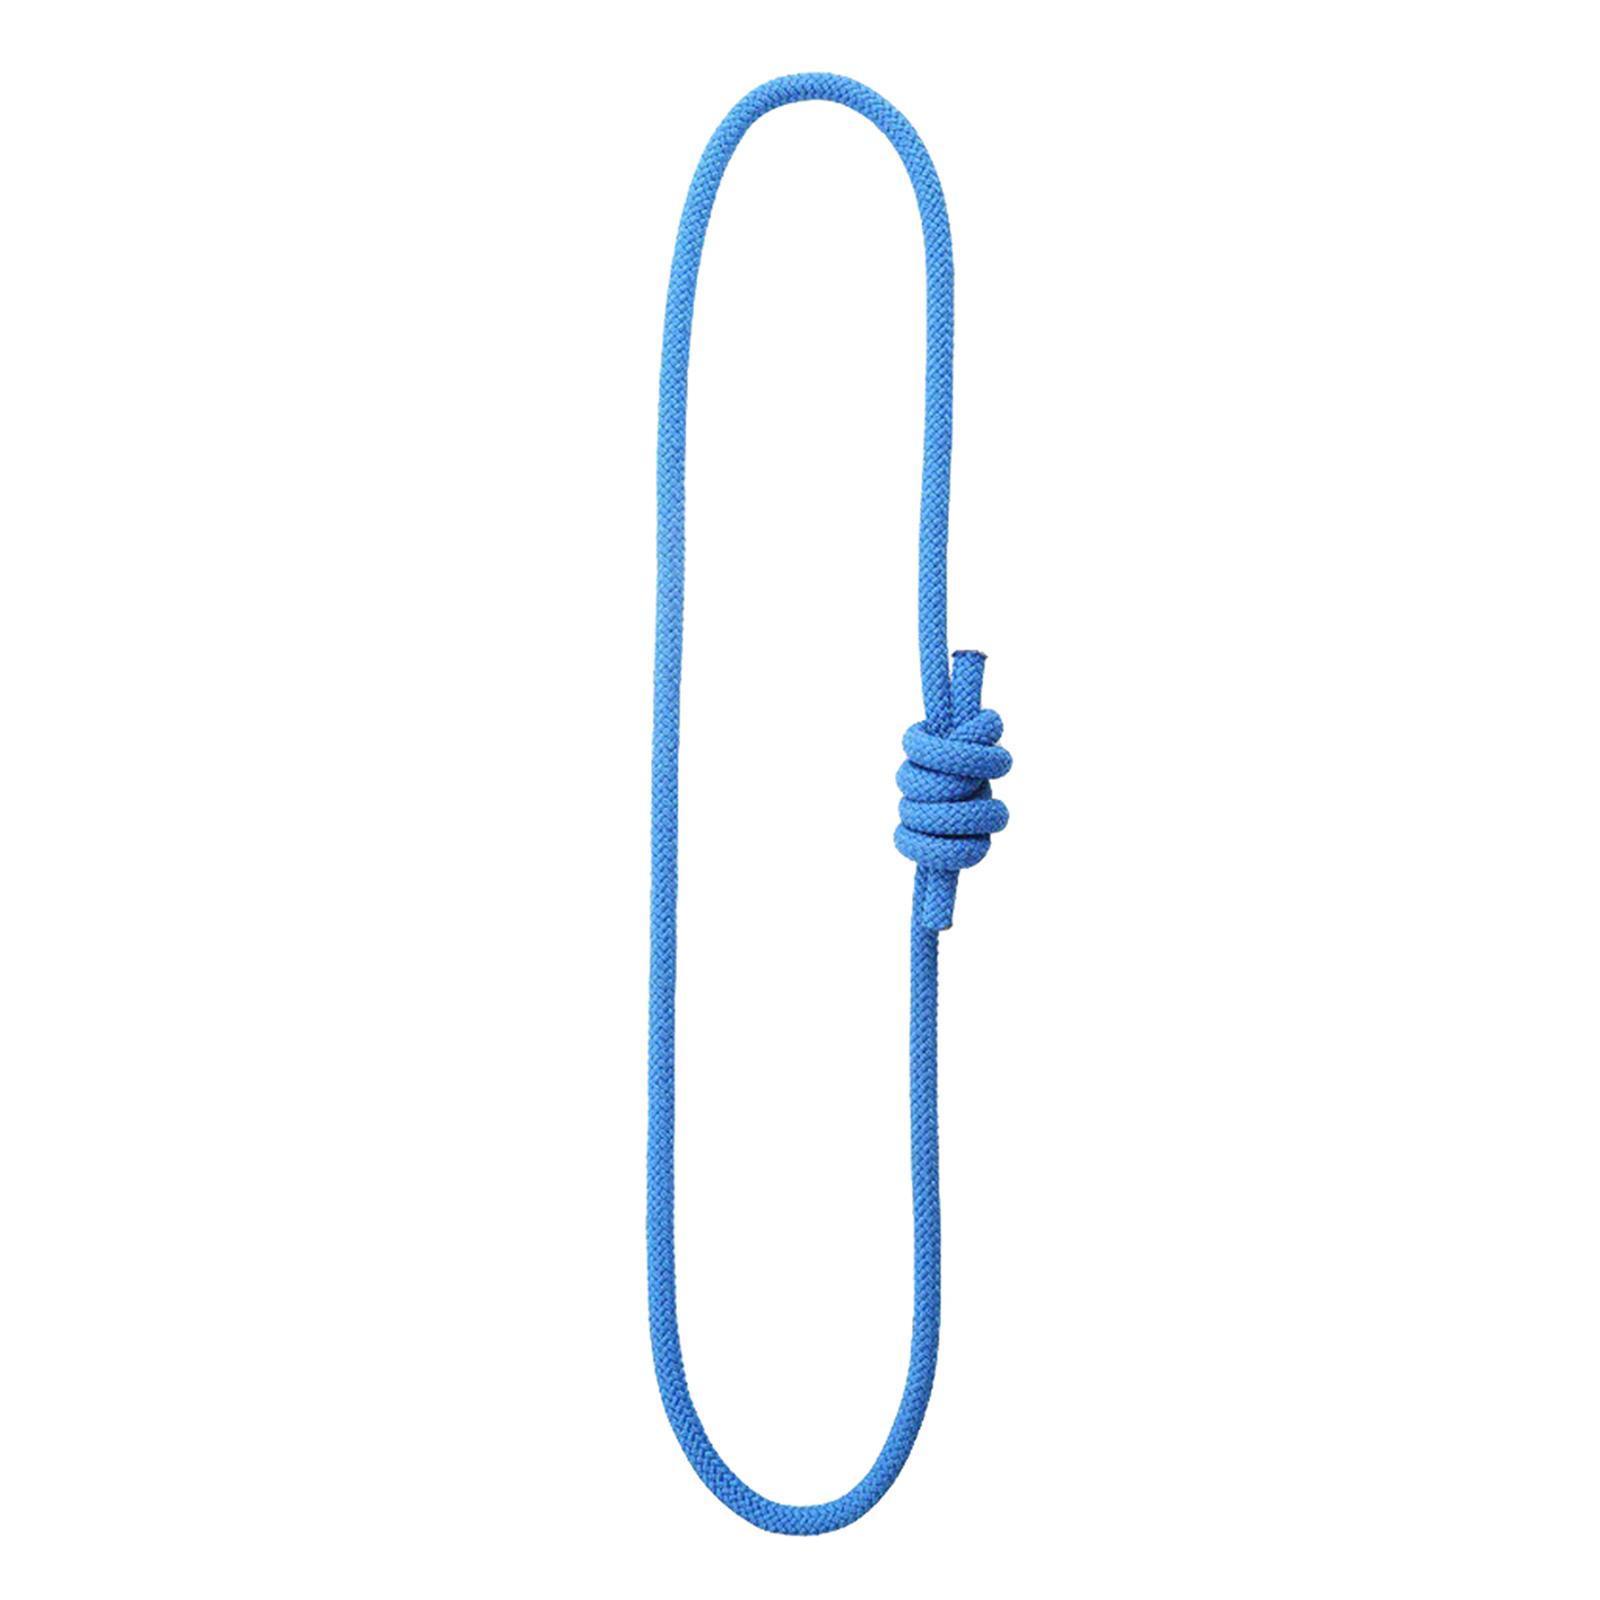 6mm-Heat-Resistant-Rescue-Rope-Rock-Outdoor-Climbing-Rappel-Arborist-Cord thumbnail 3